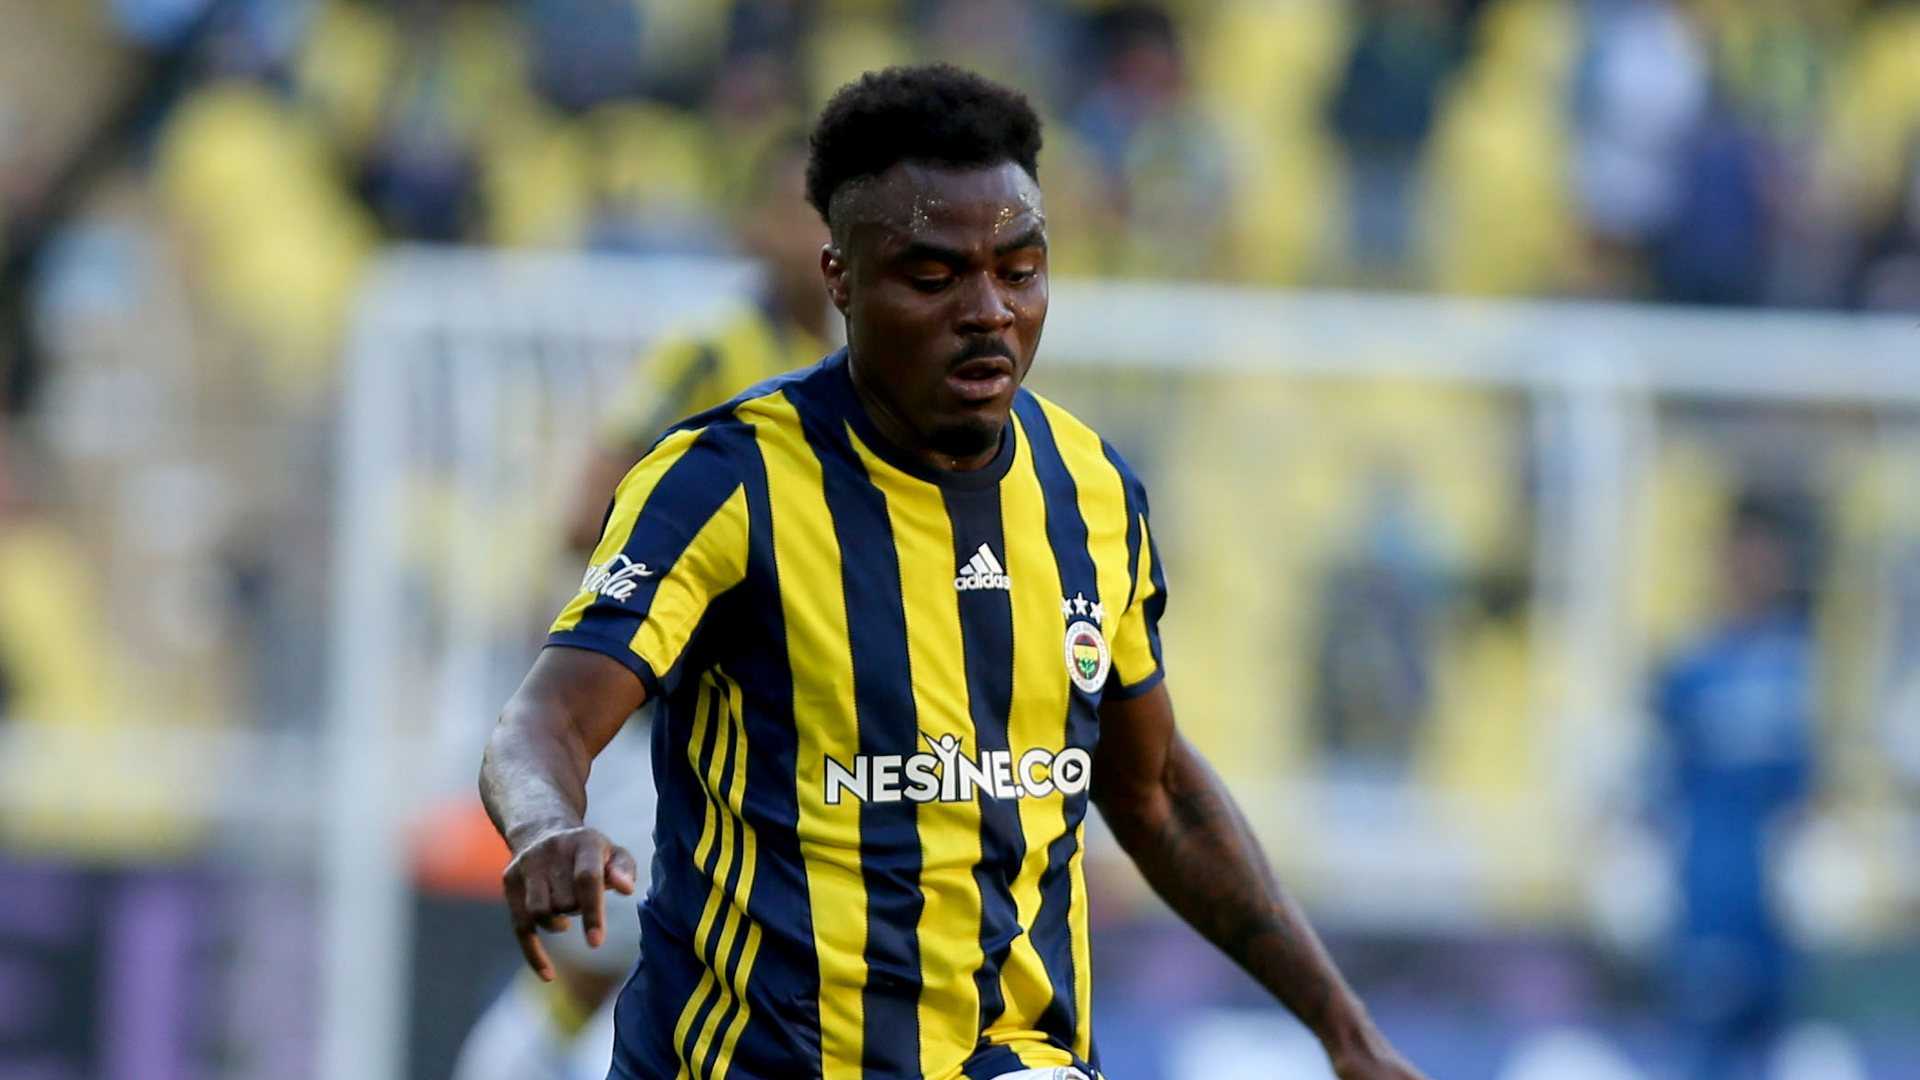 Emmanuel Emenike: Former Fenerbahce star joins Belgian club Westerlo